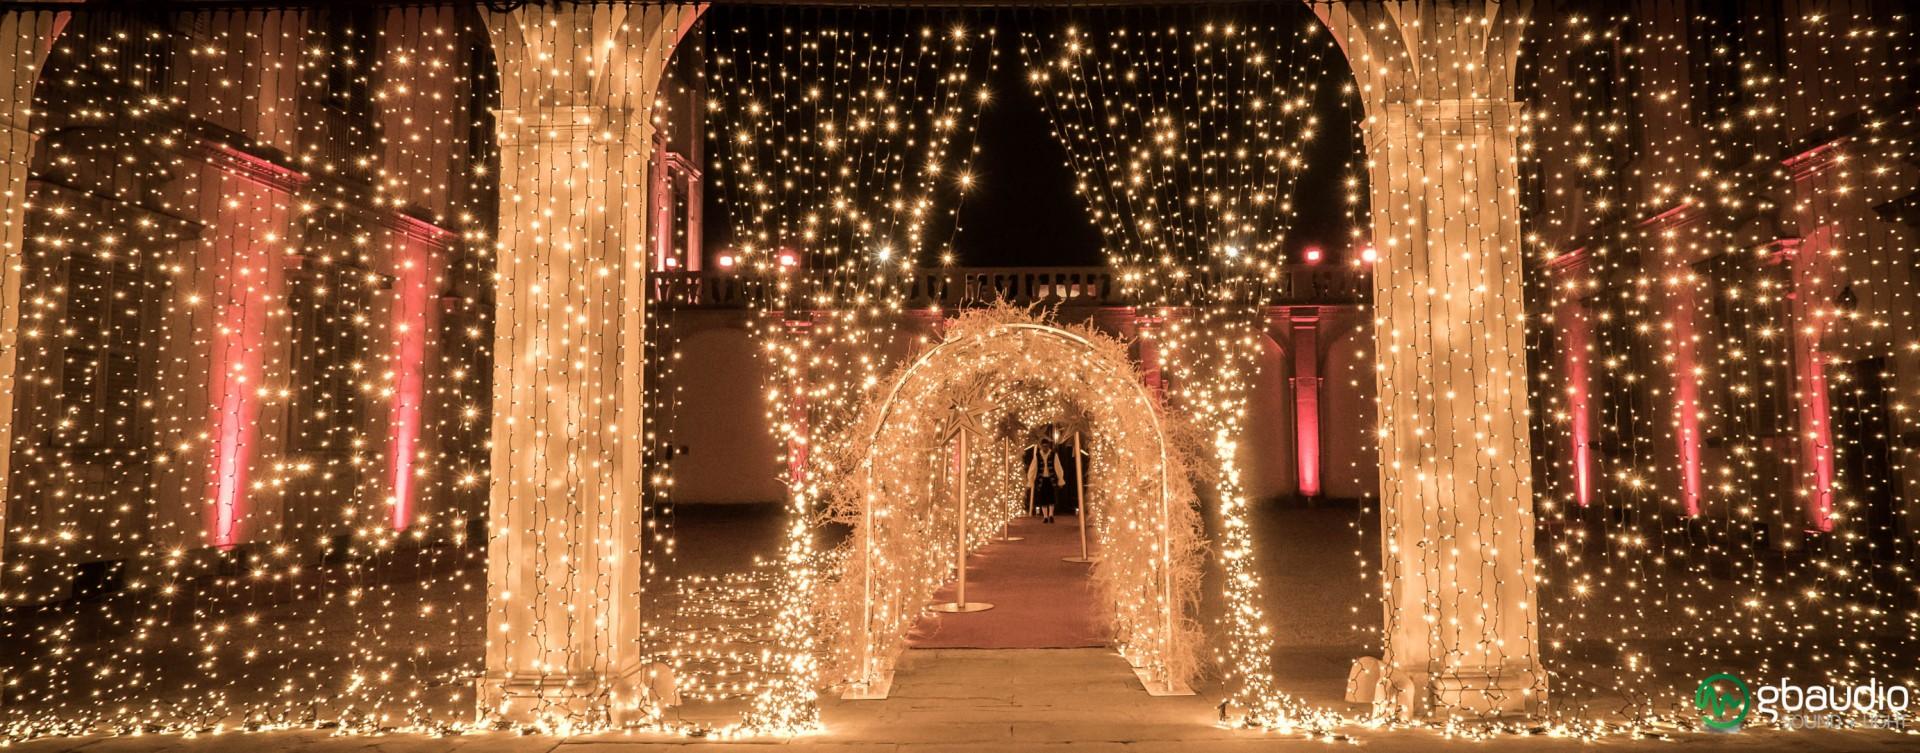 Fairy lights - 2